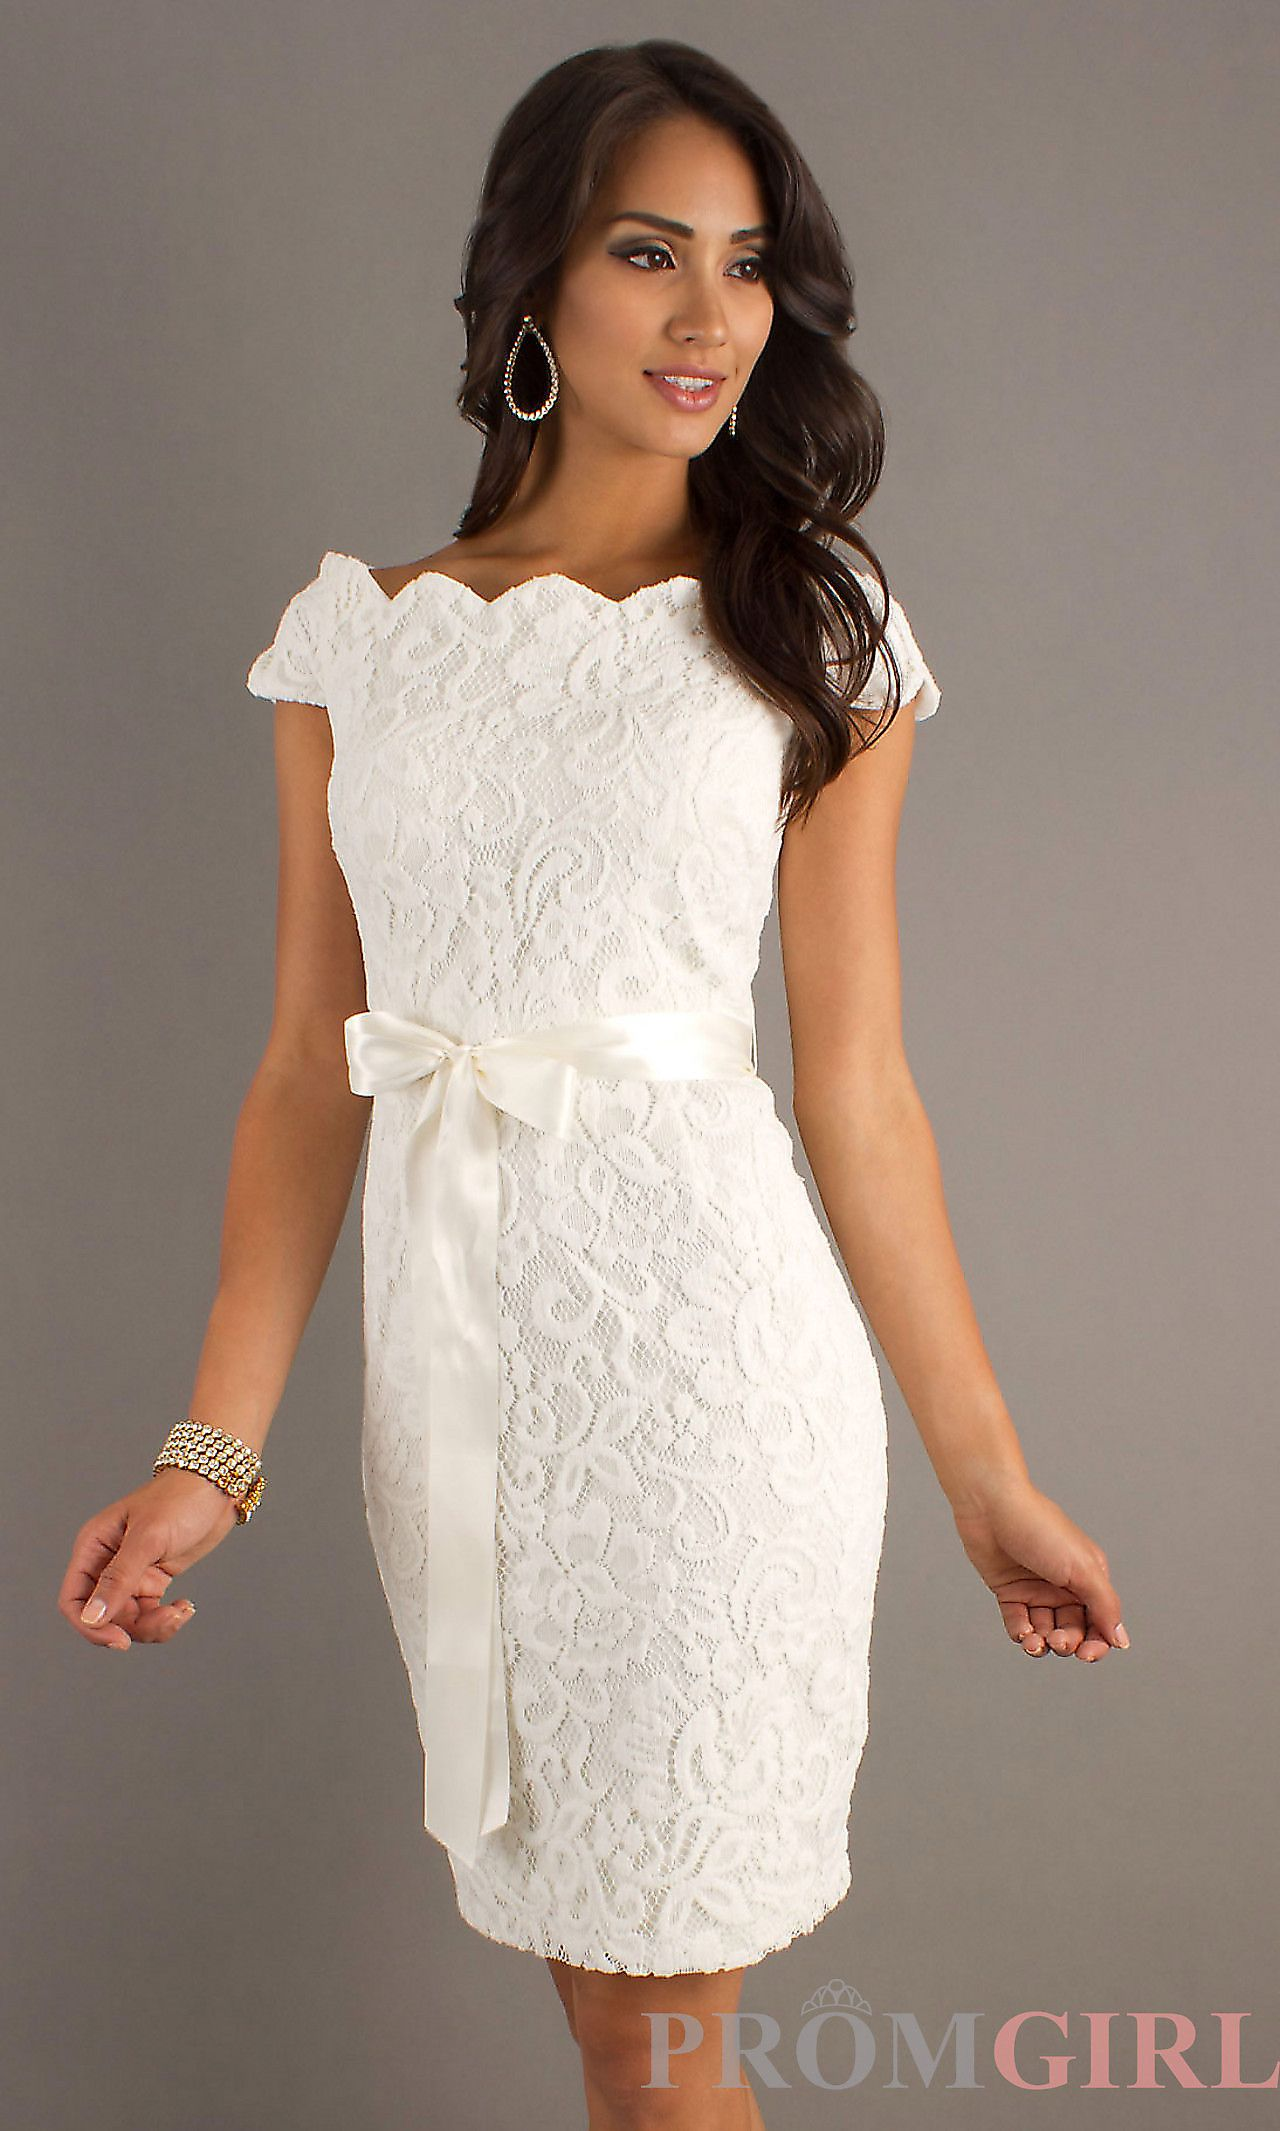 Medium Of White Bridal Shower Dress